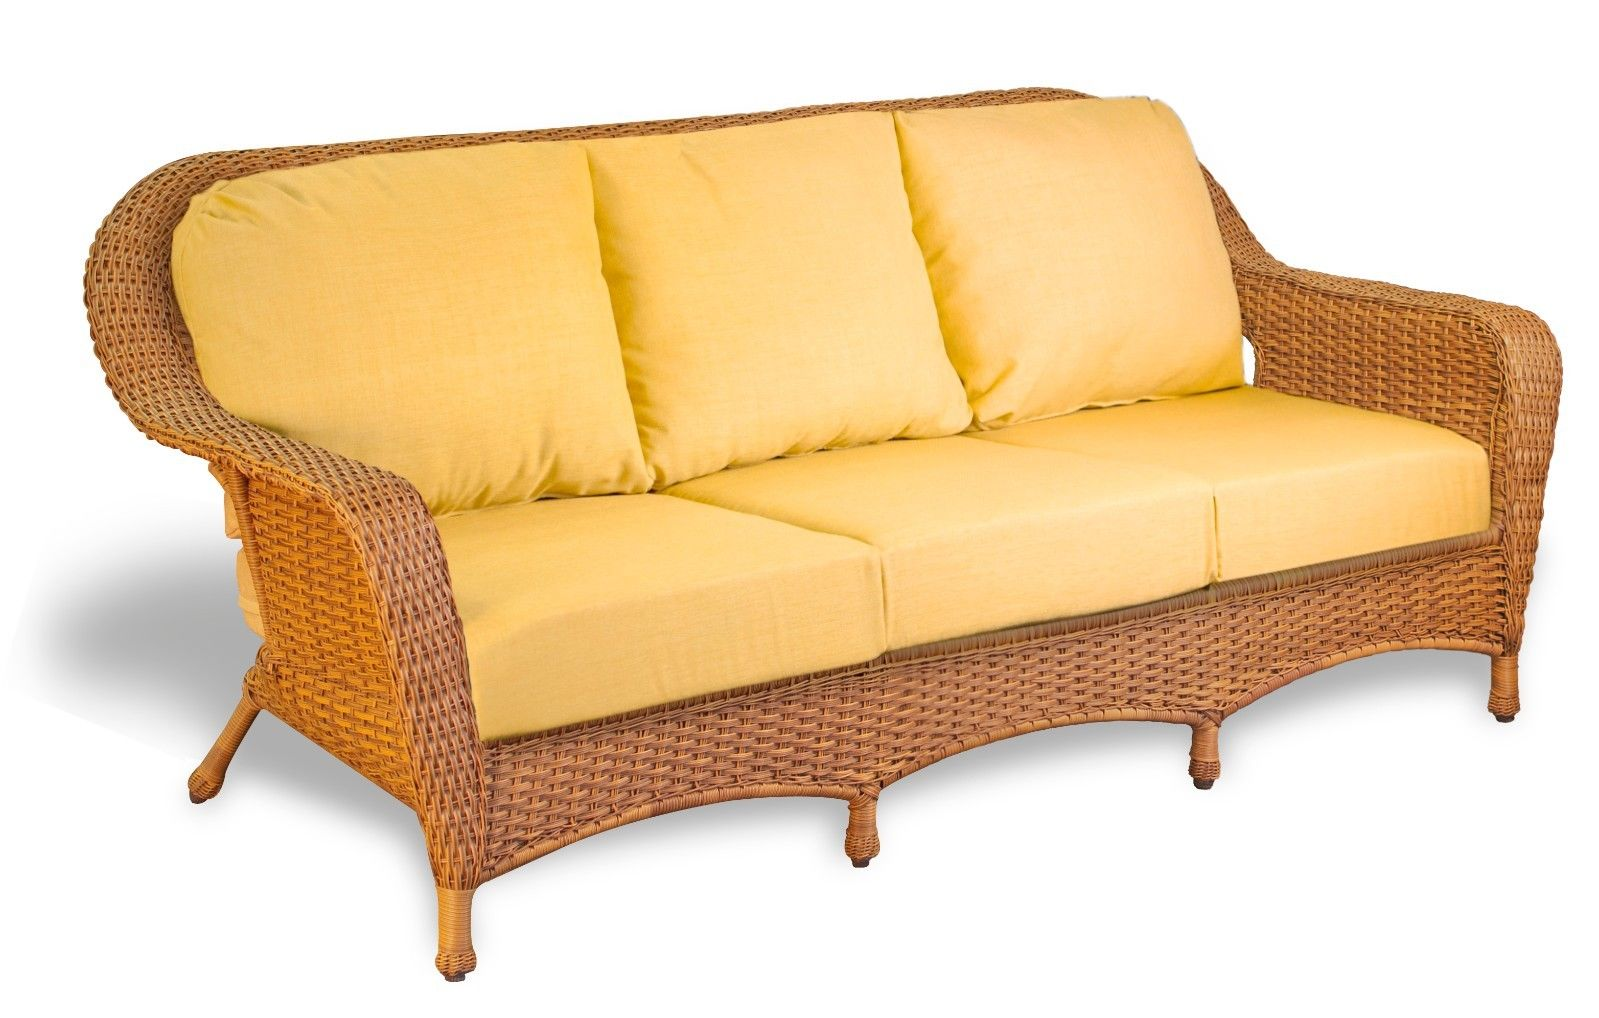 #56 - Outdoor Patio Garden Furniture Mojave Resin Wicker Sofa - Rave Yellow